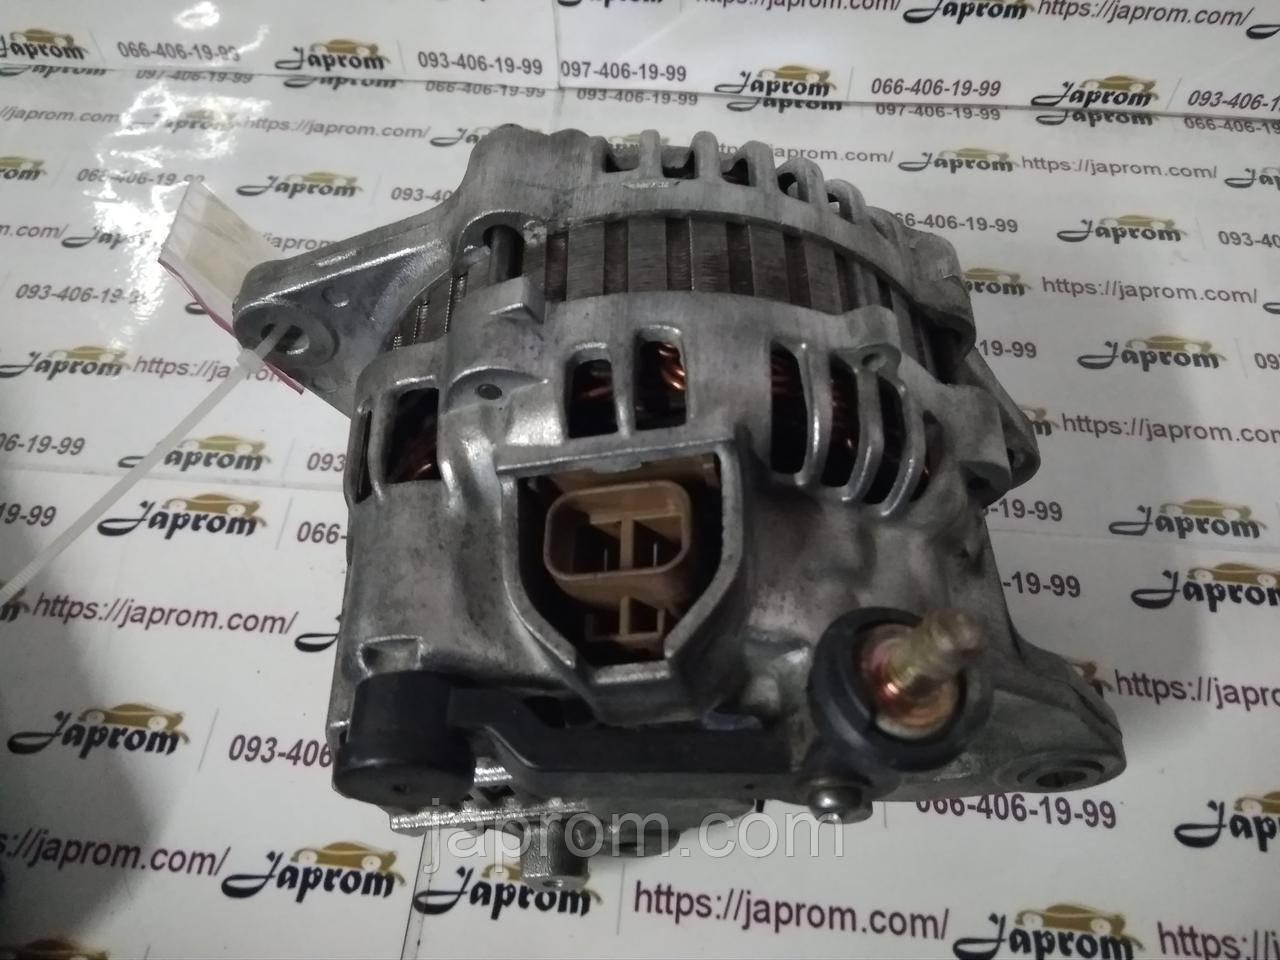 Генератор Mazda 626 GE FS05-18-300 A2T33191 80A